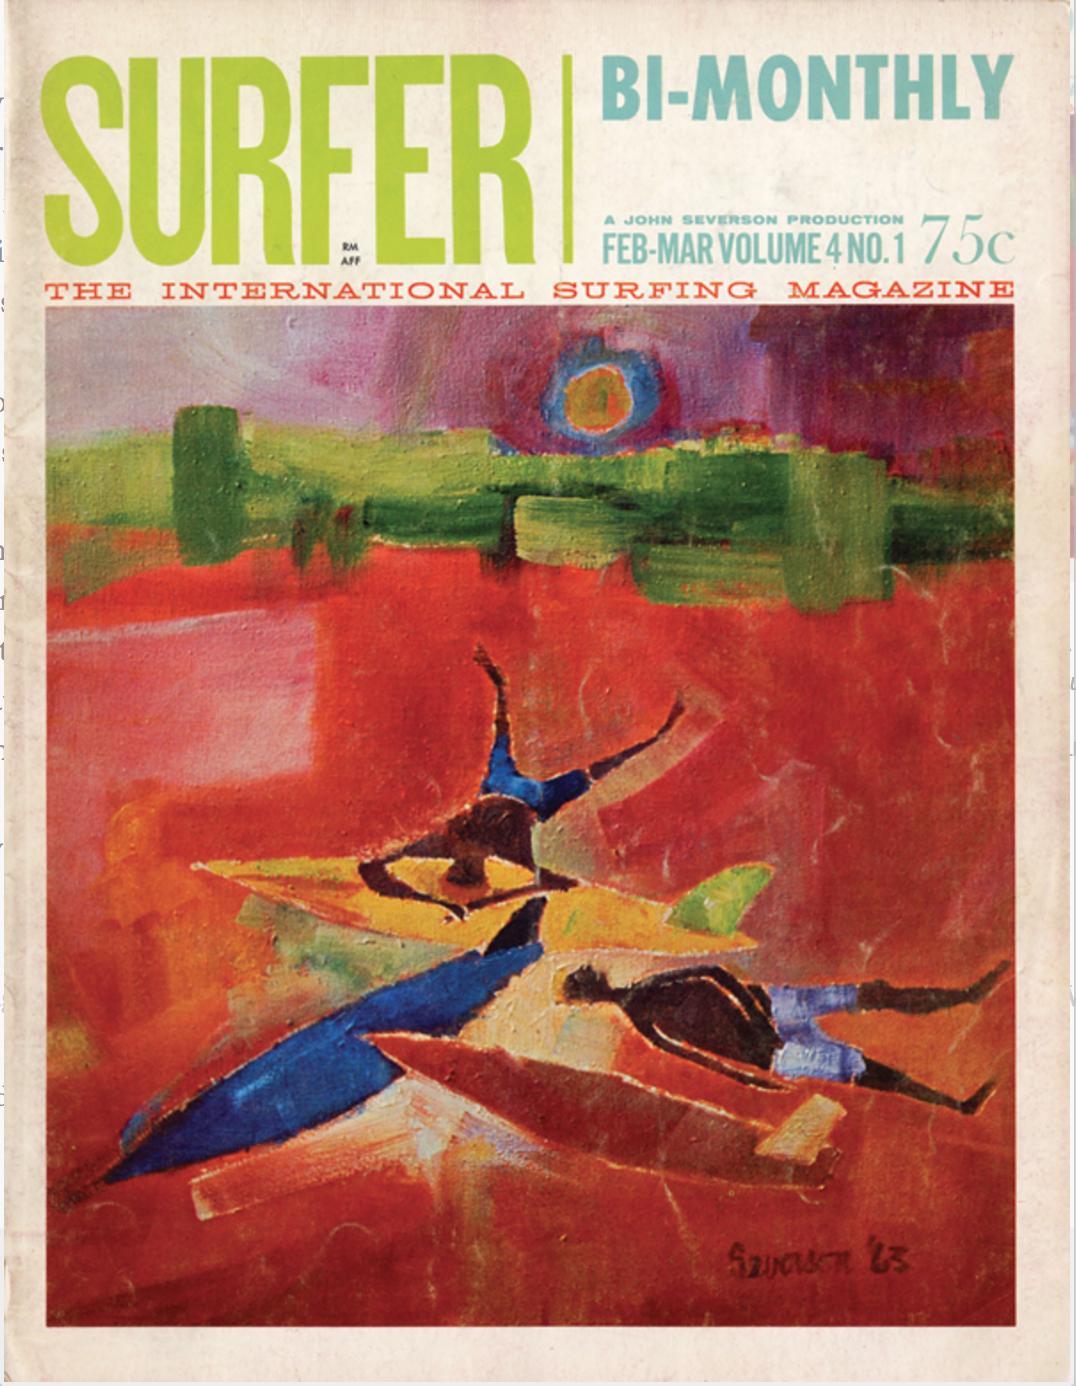 Surfer Magazine February 1963 Cover by John Severson